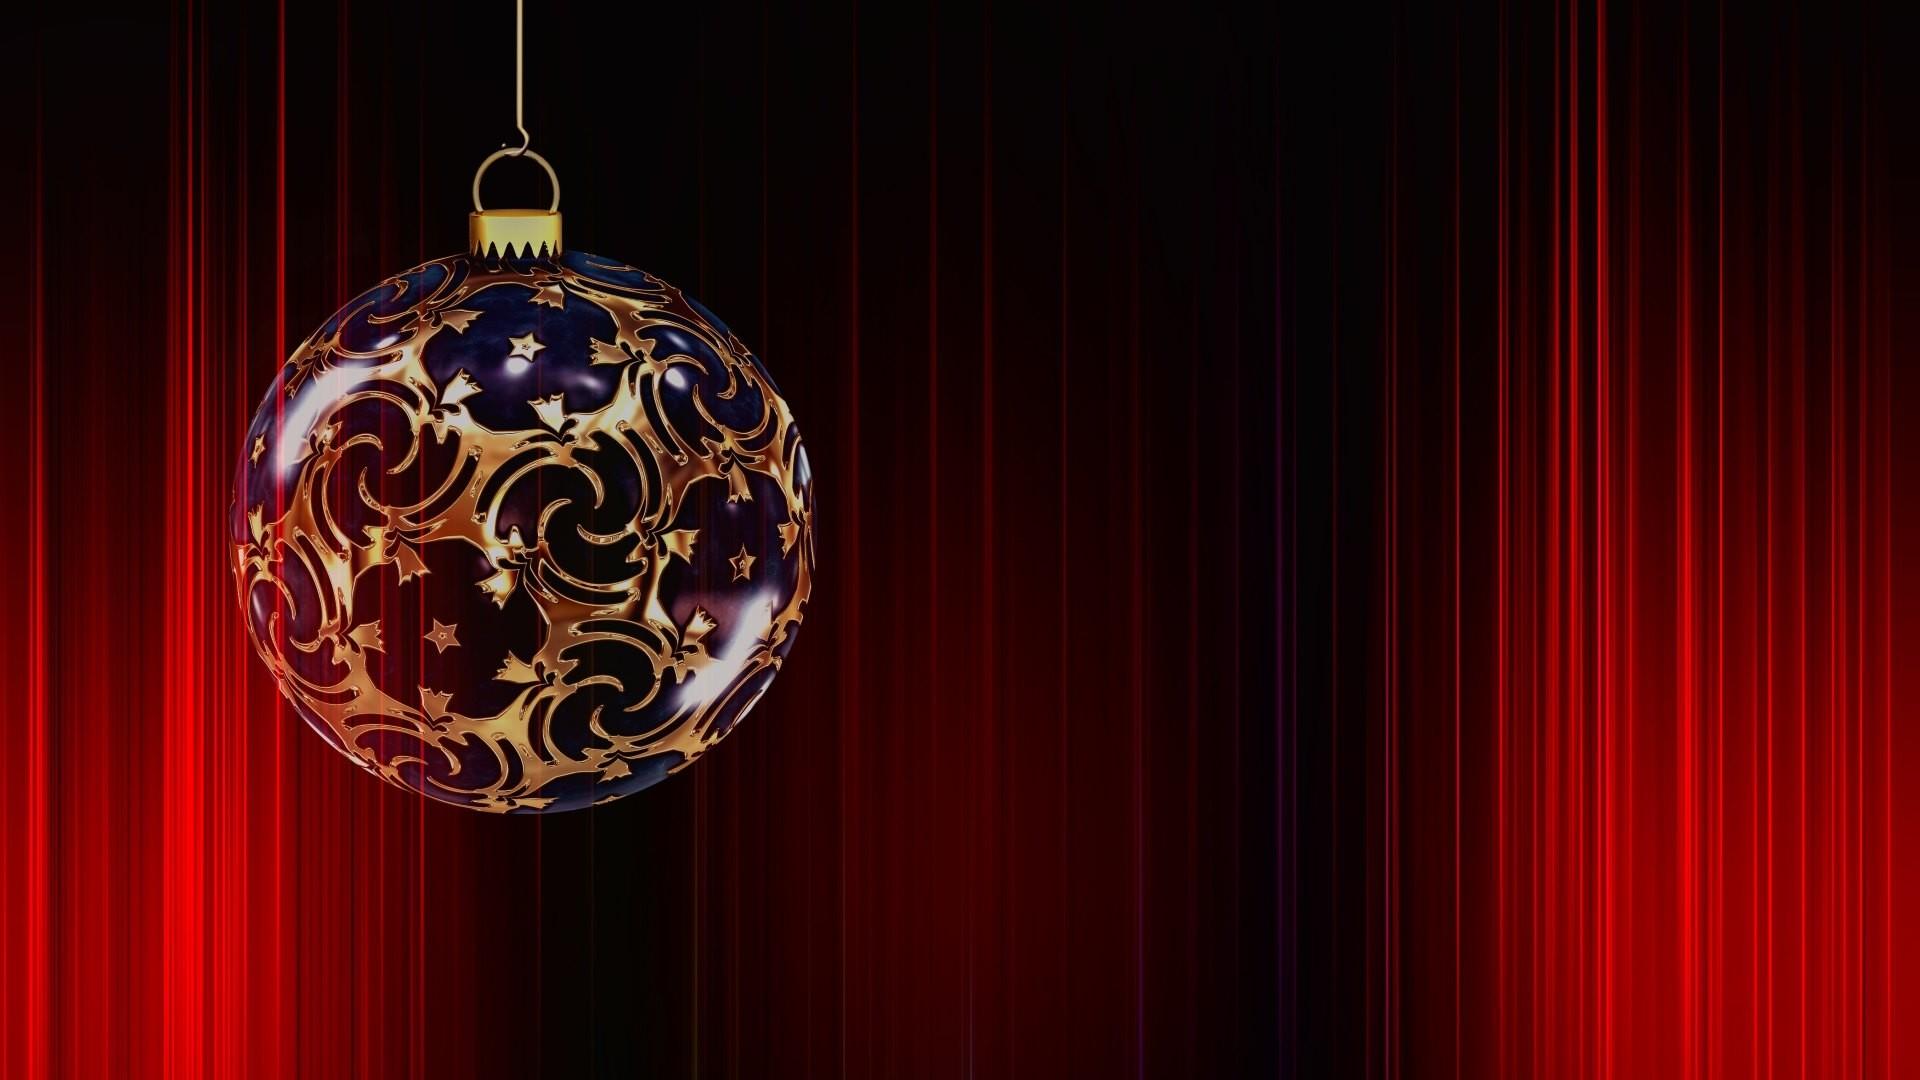 hd christmas wallpaper 1920x1080 67 images